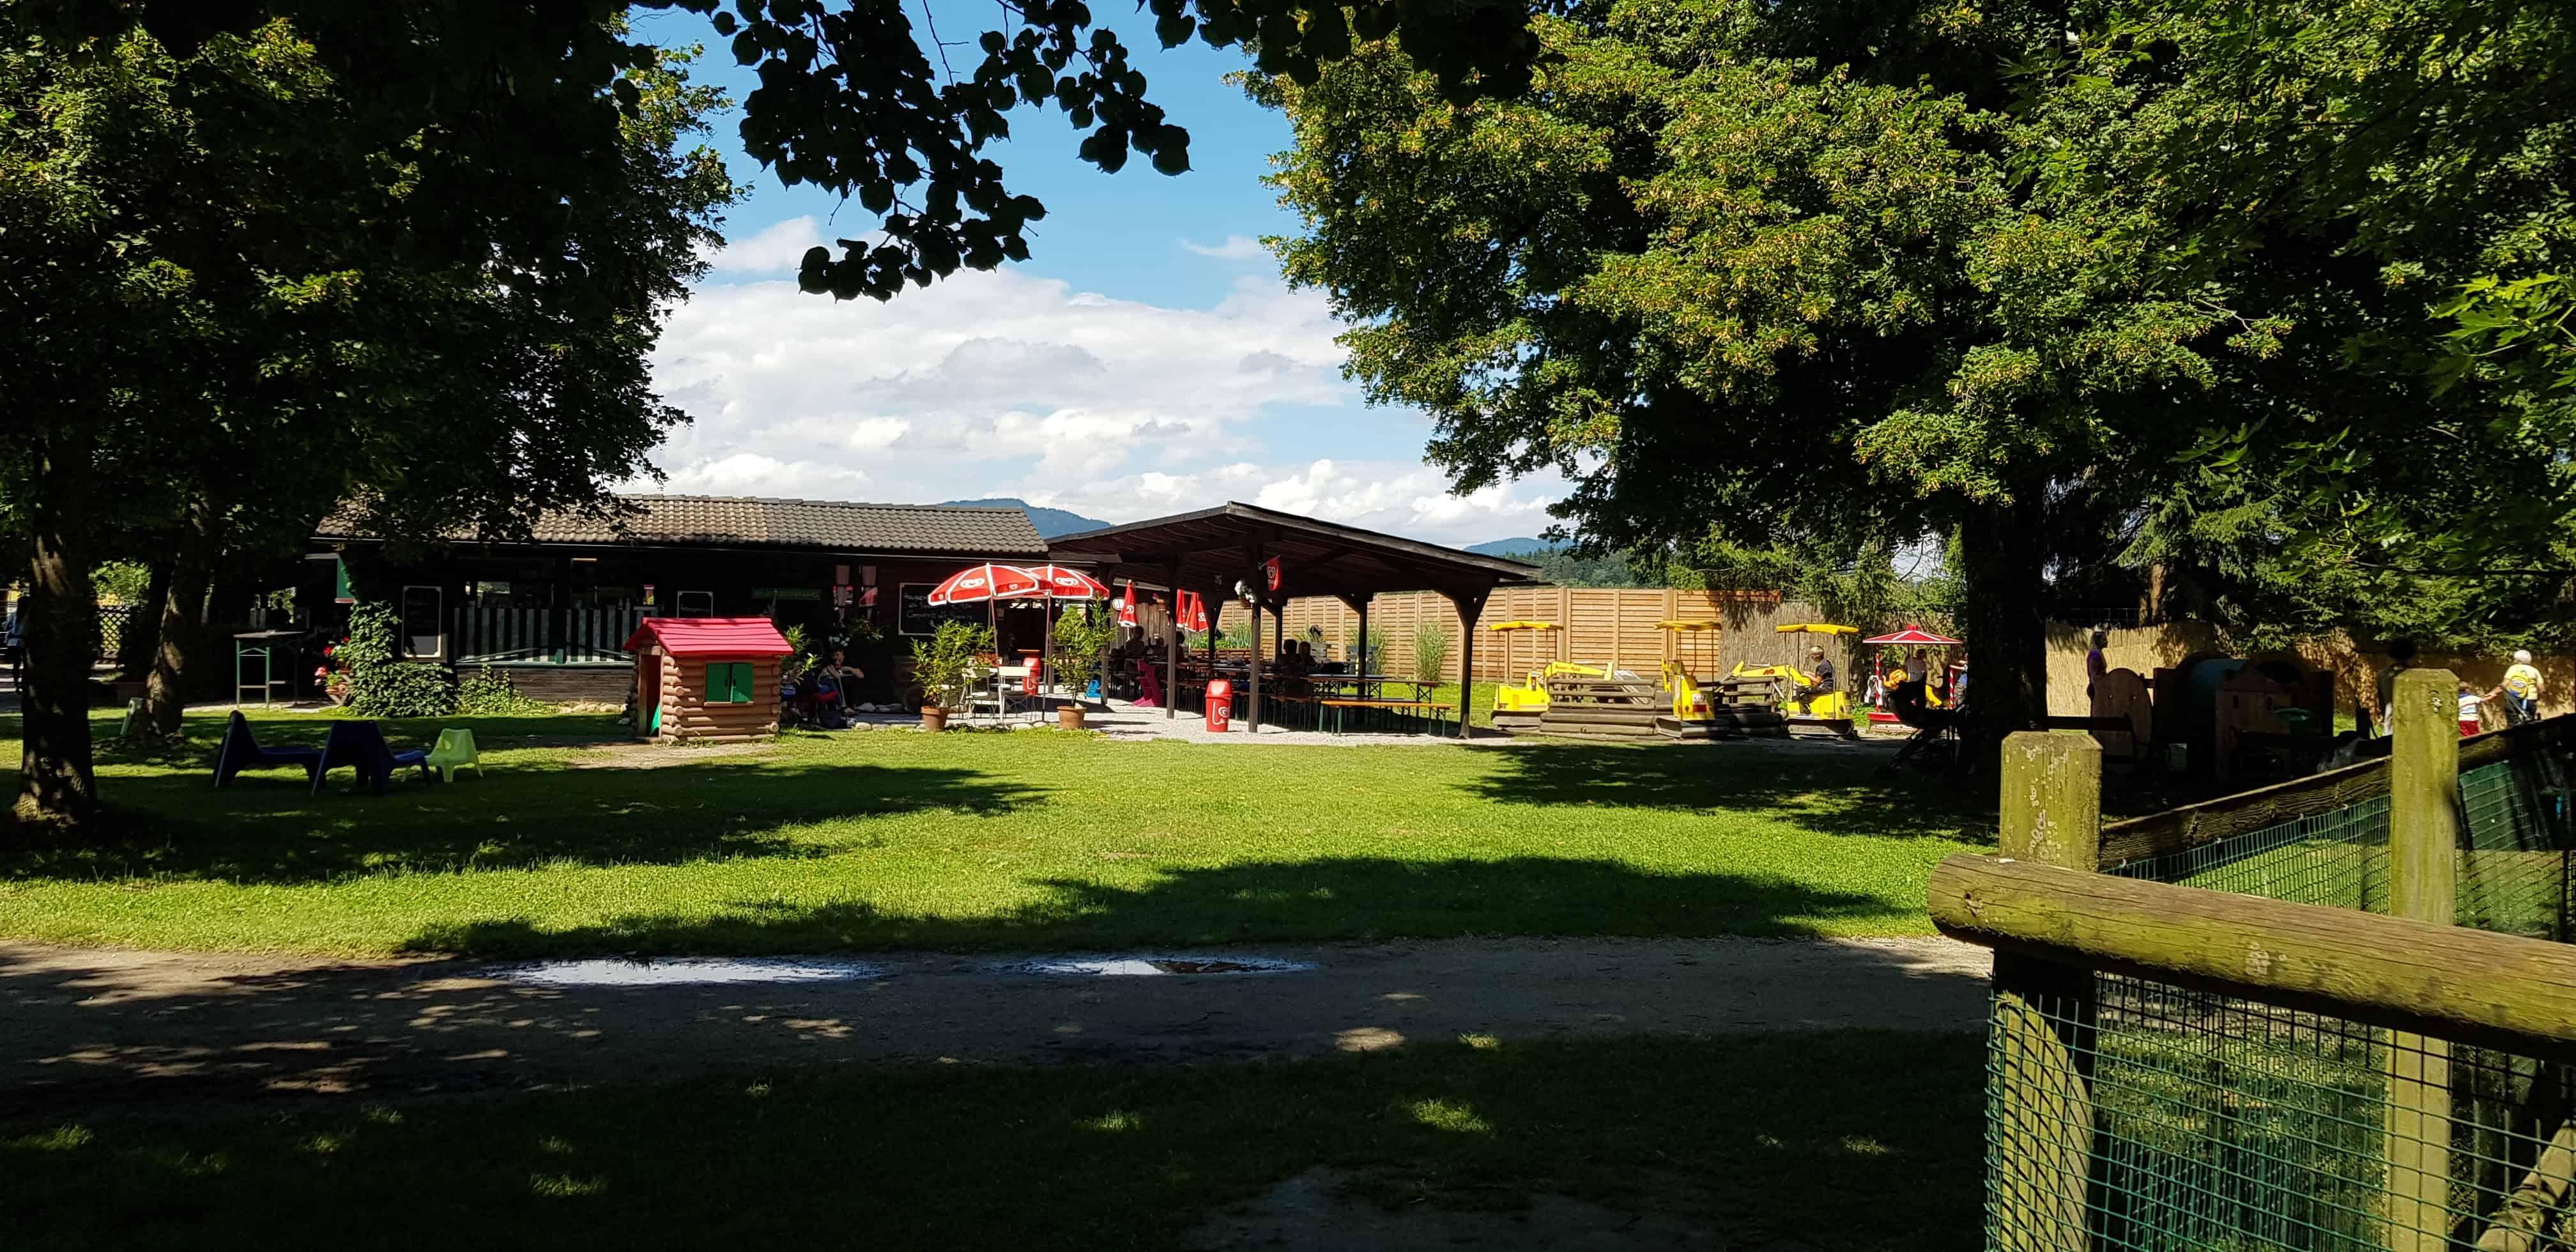 Kinderspielplatz und Buffet im Tierpark Schloss Rosegg Nähe Wörthersee